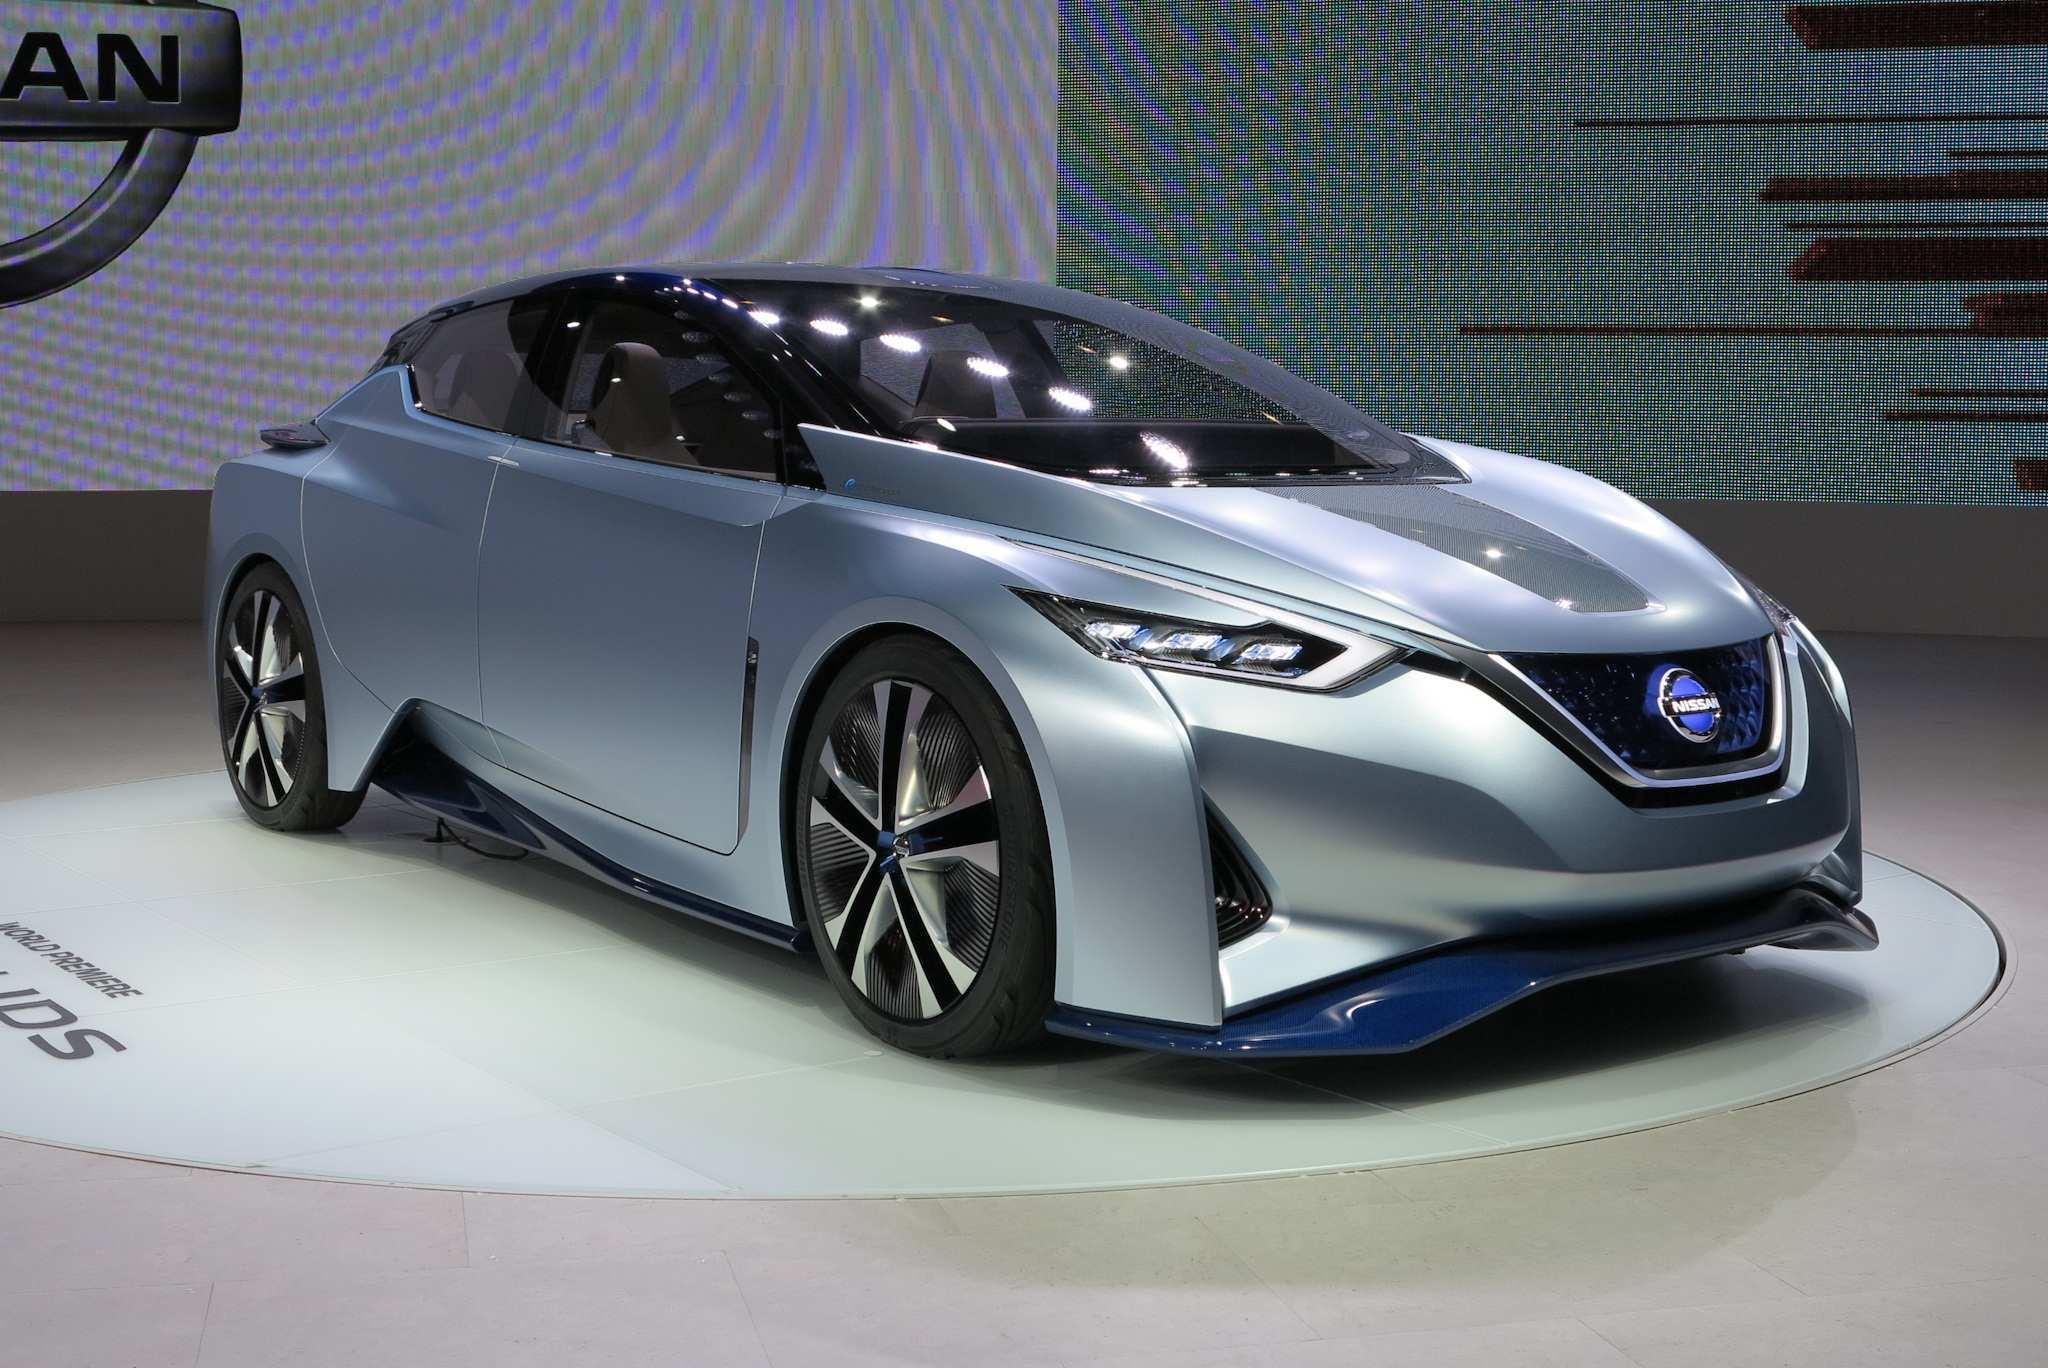 22 Best Review 2020 Nissan Leaf First Drive for 2020 Nissan Leaf